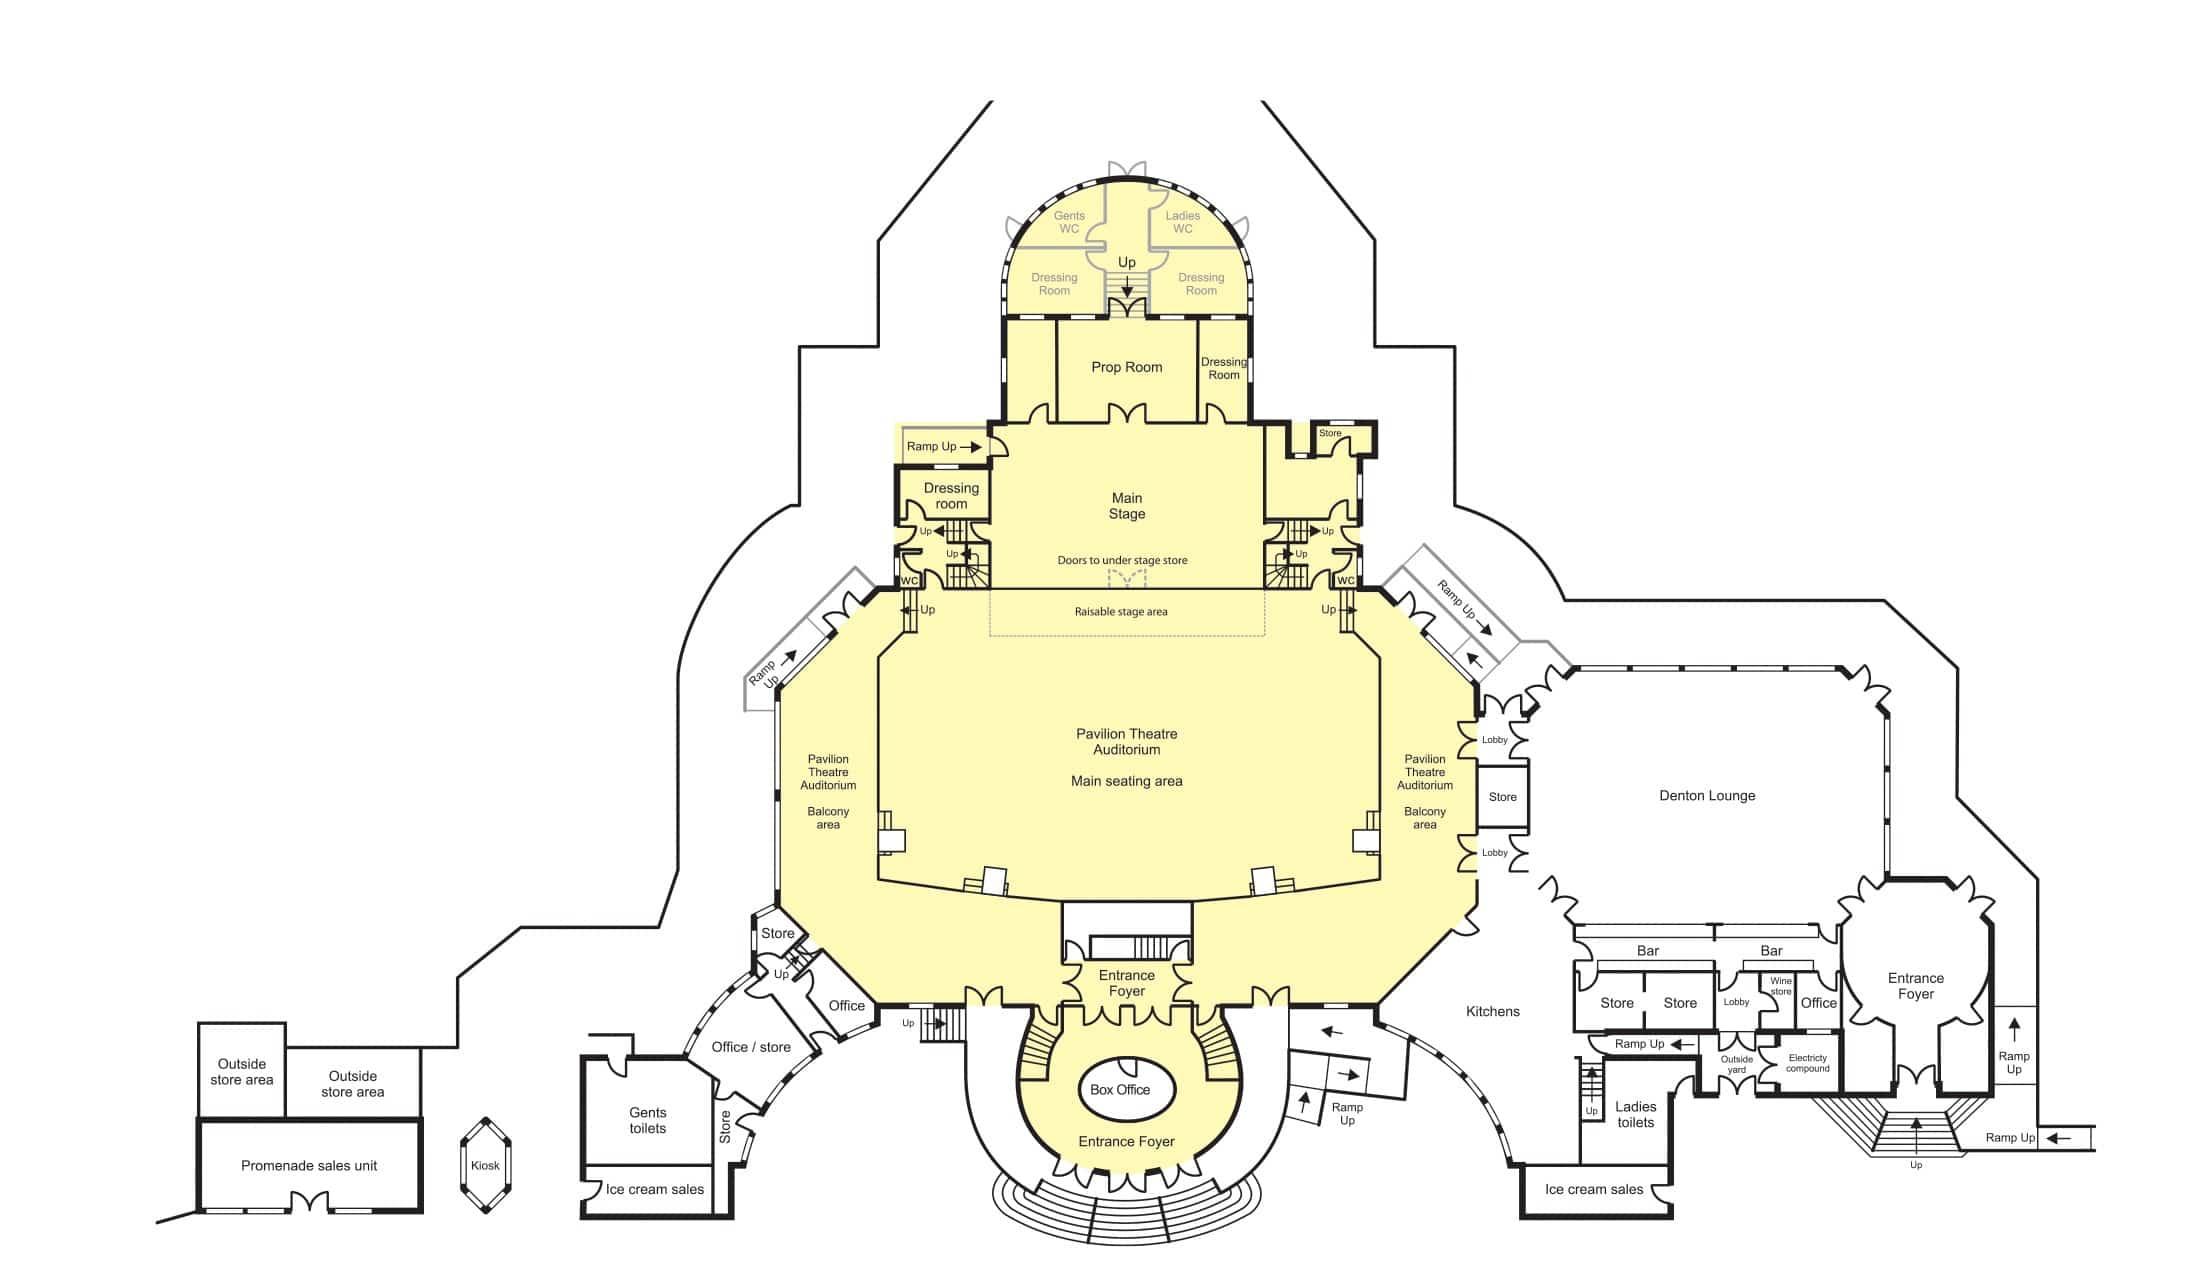 Pavilion Theatre - Floor Plan